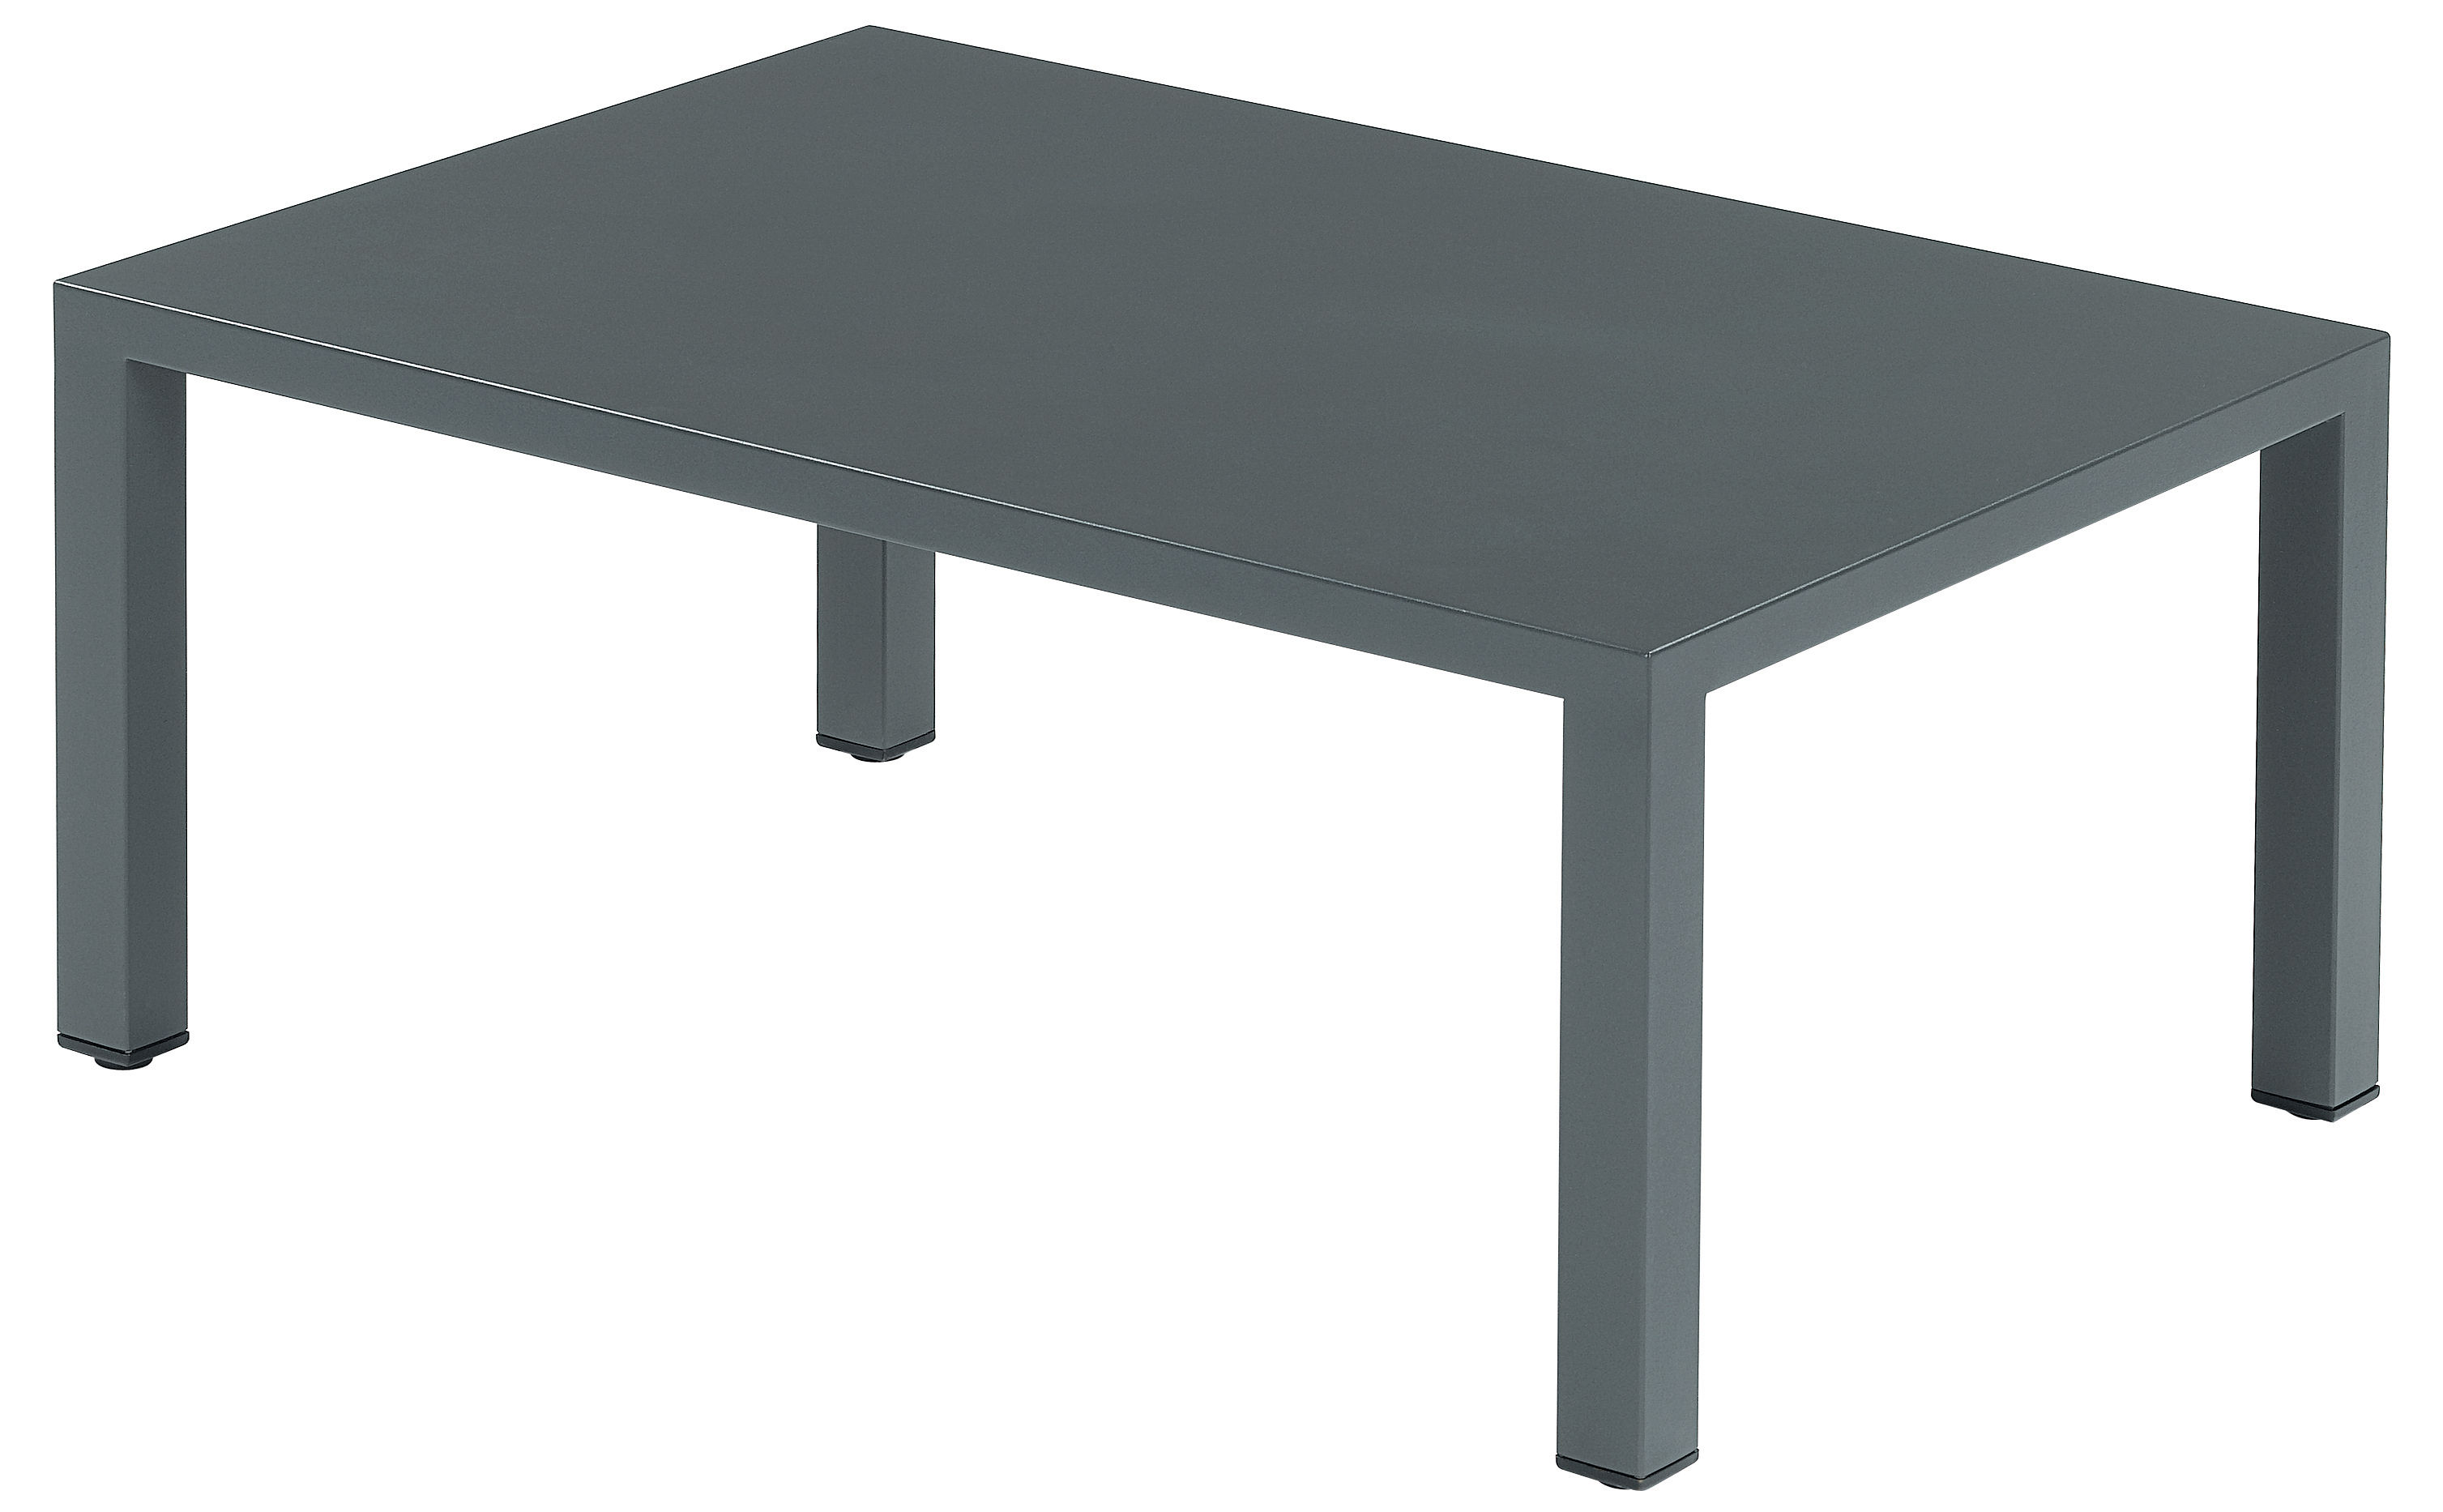 Table basse round m ta l 70 x 100 cm fer ancien emu for Table basse design 100 x 100